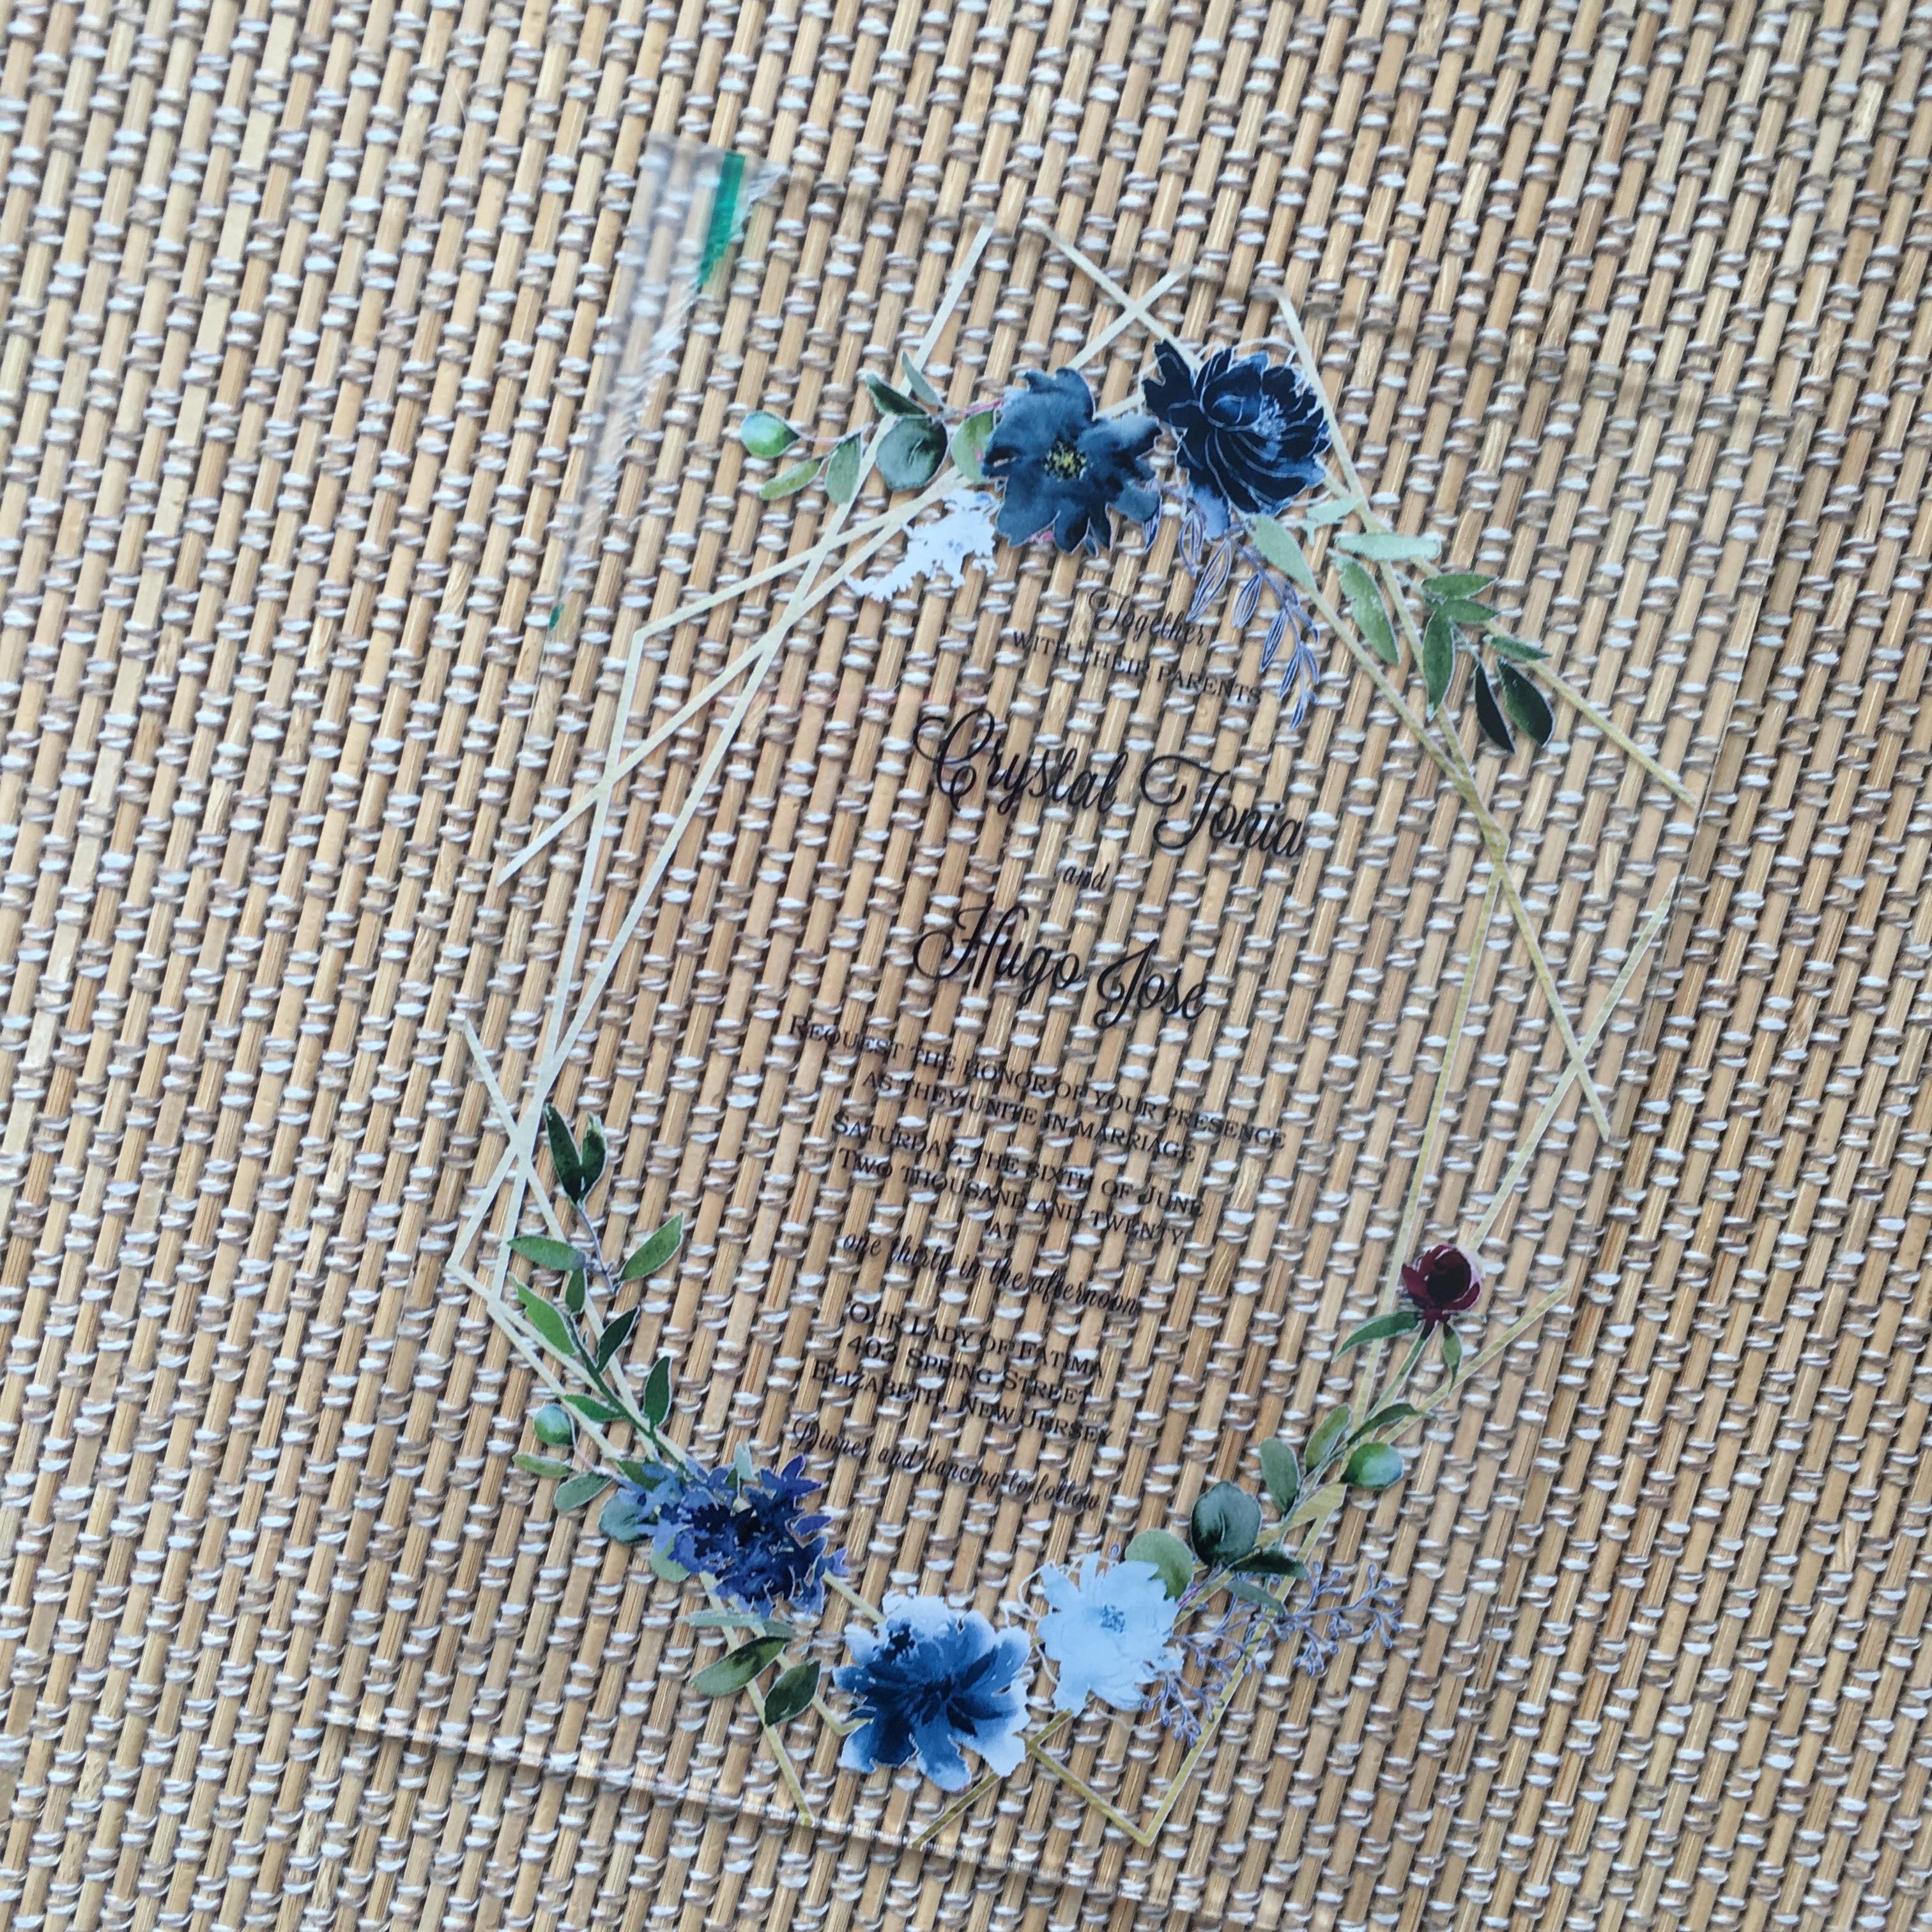 10pcs Royal Blue Wedding Invitation Card Lace Floral Custom Wedding Souvenir Cards For Wedding